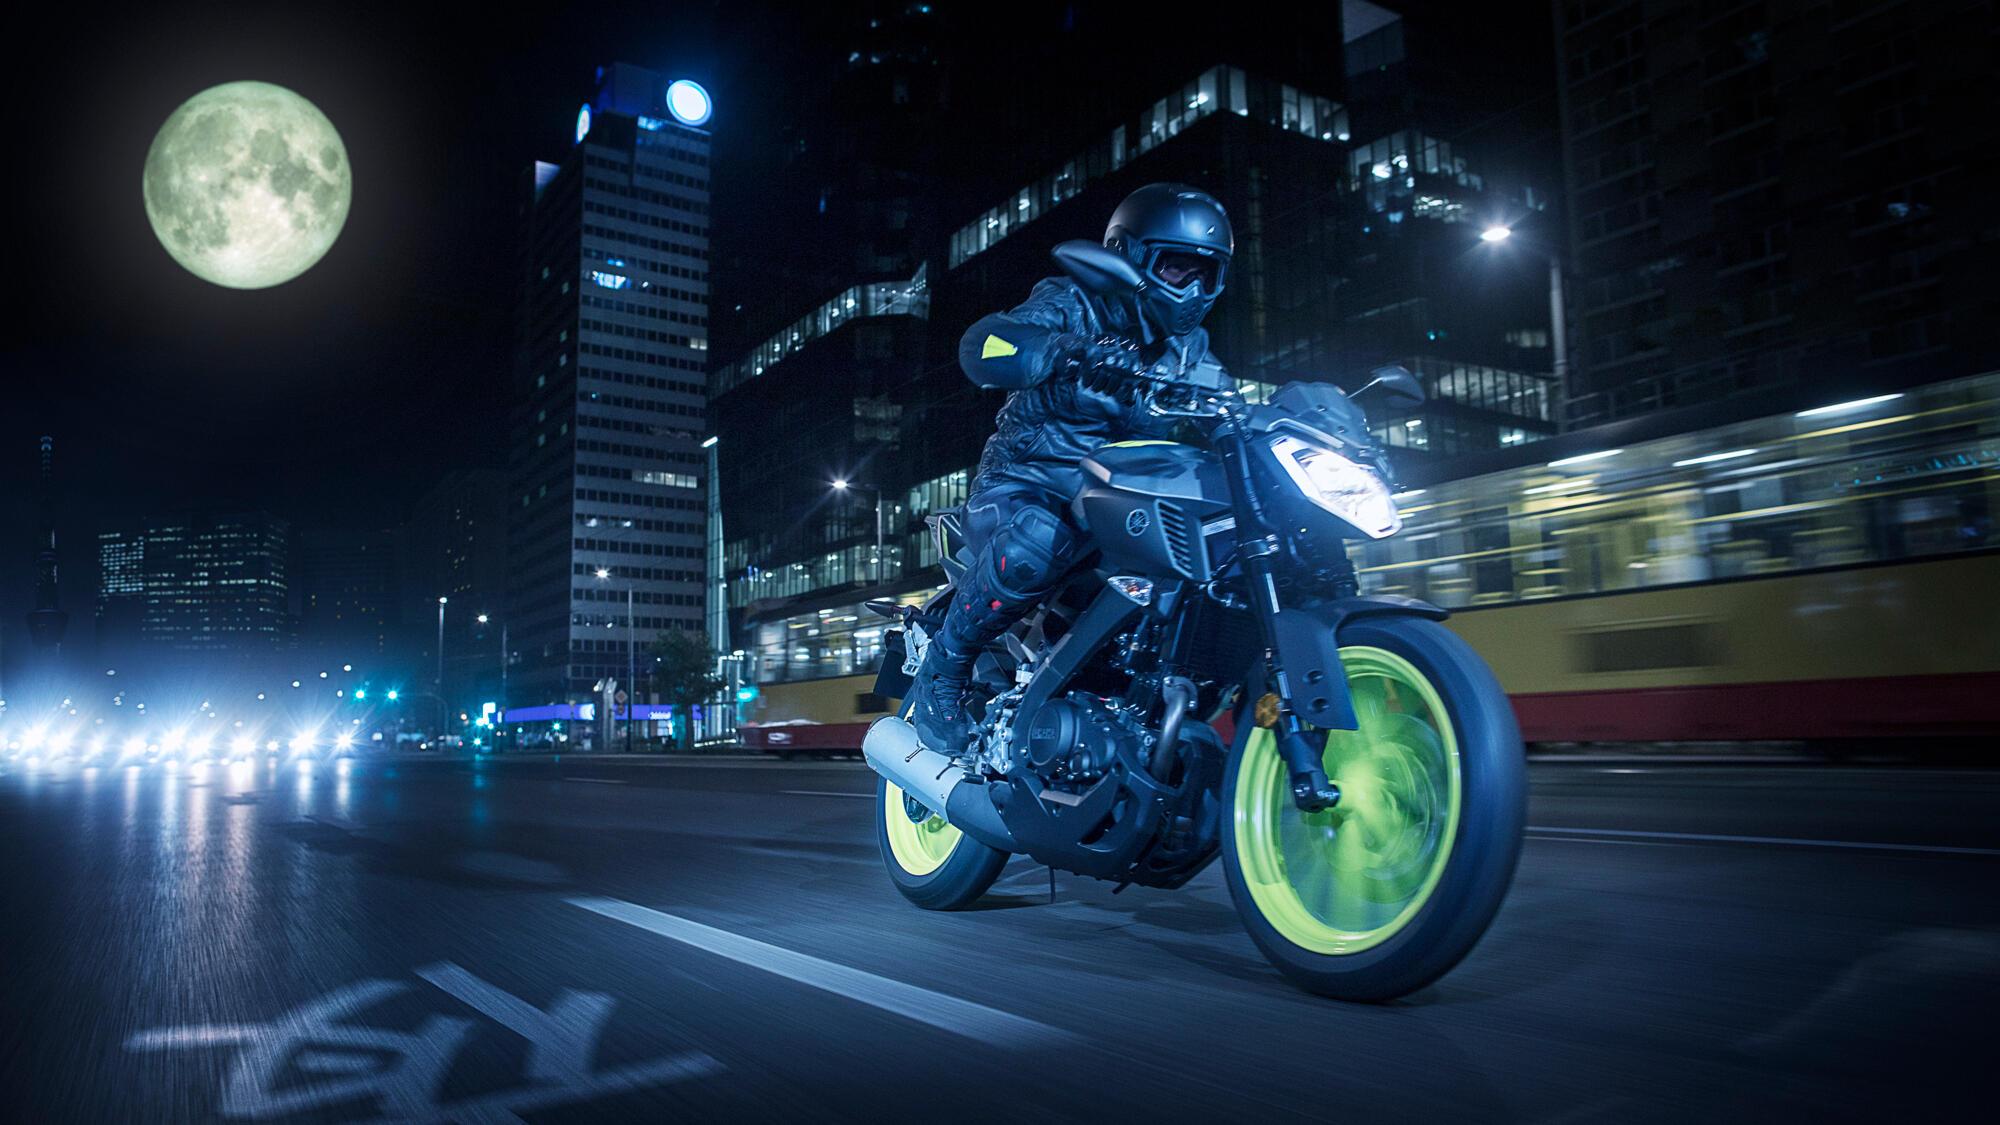 Mt 125 2018 Motorcycles Yme Website Cool Sport Bike Stroke Wiring Diagram Image Thumbnail